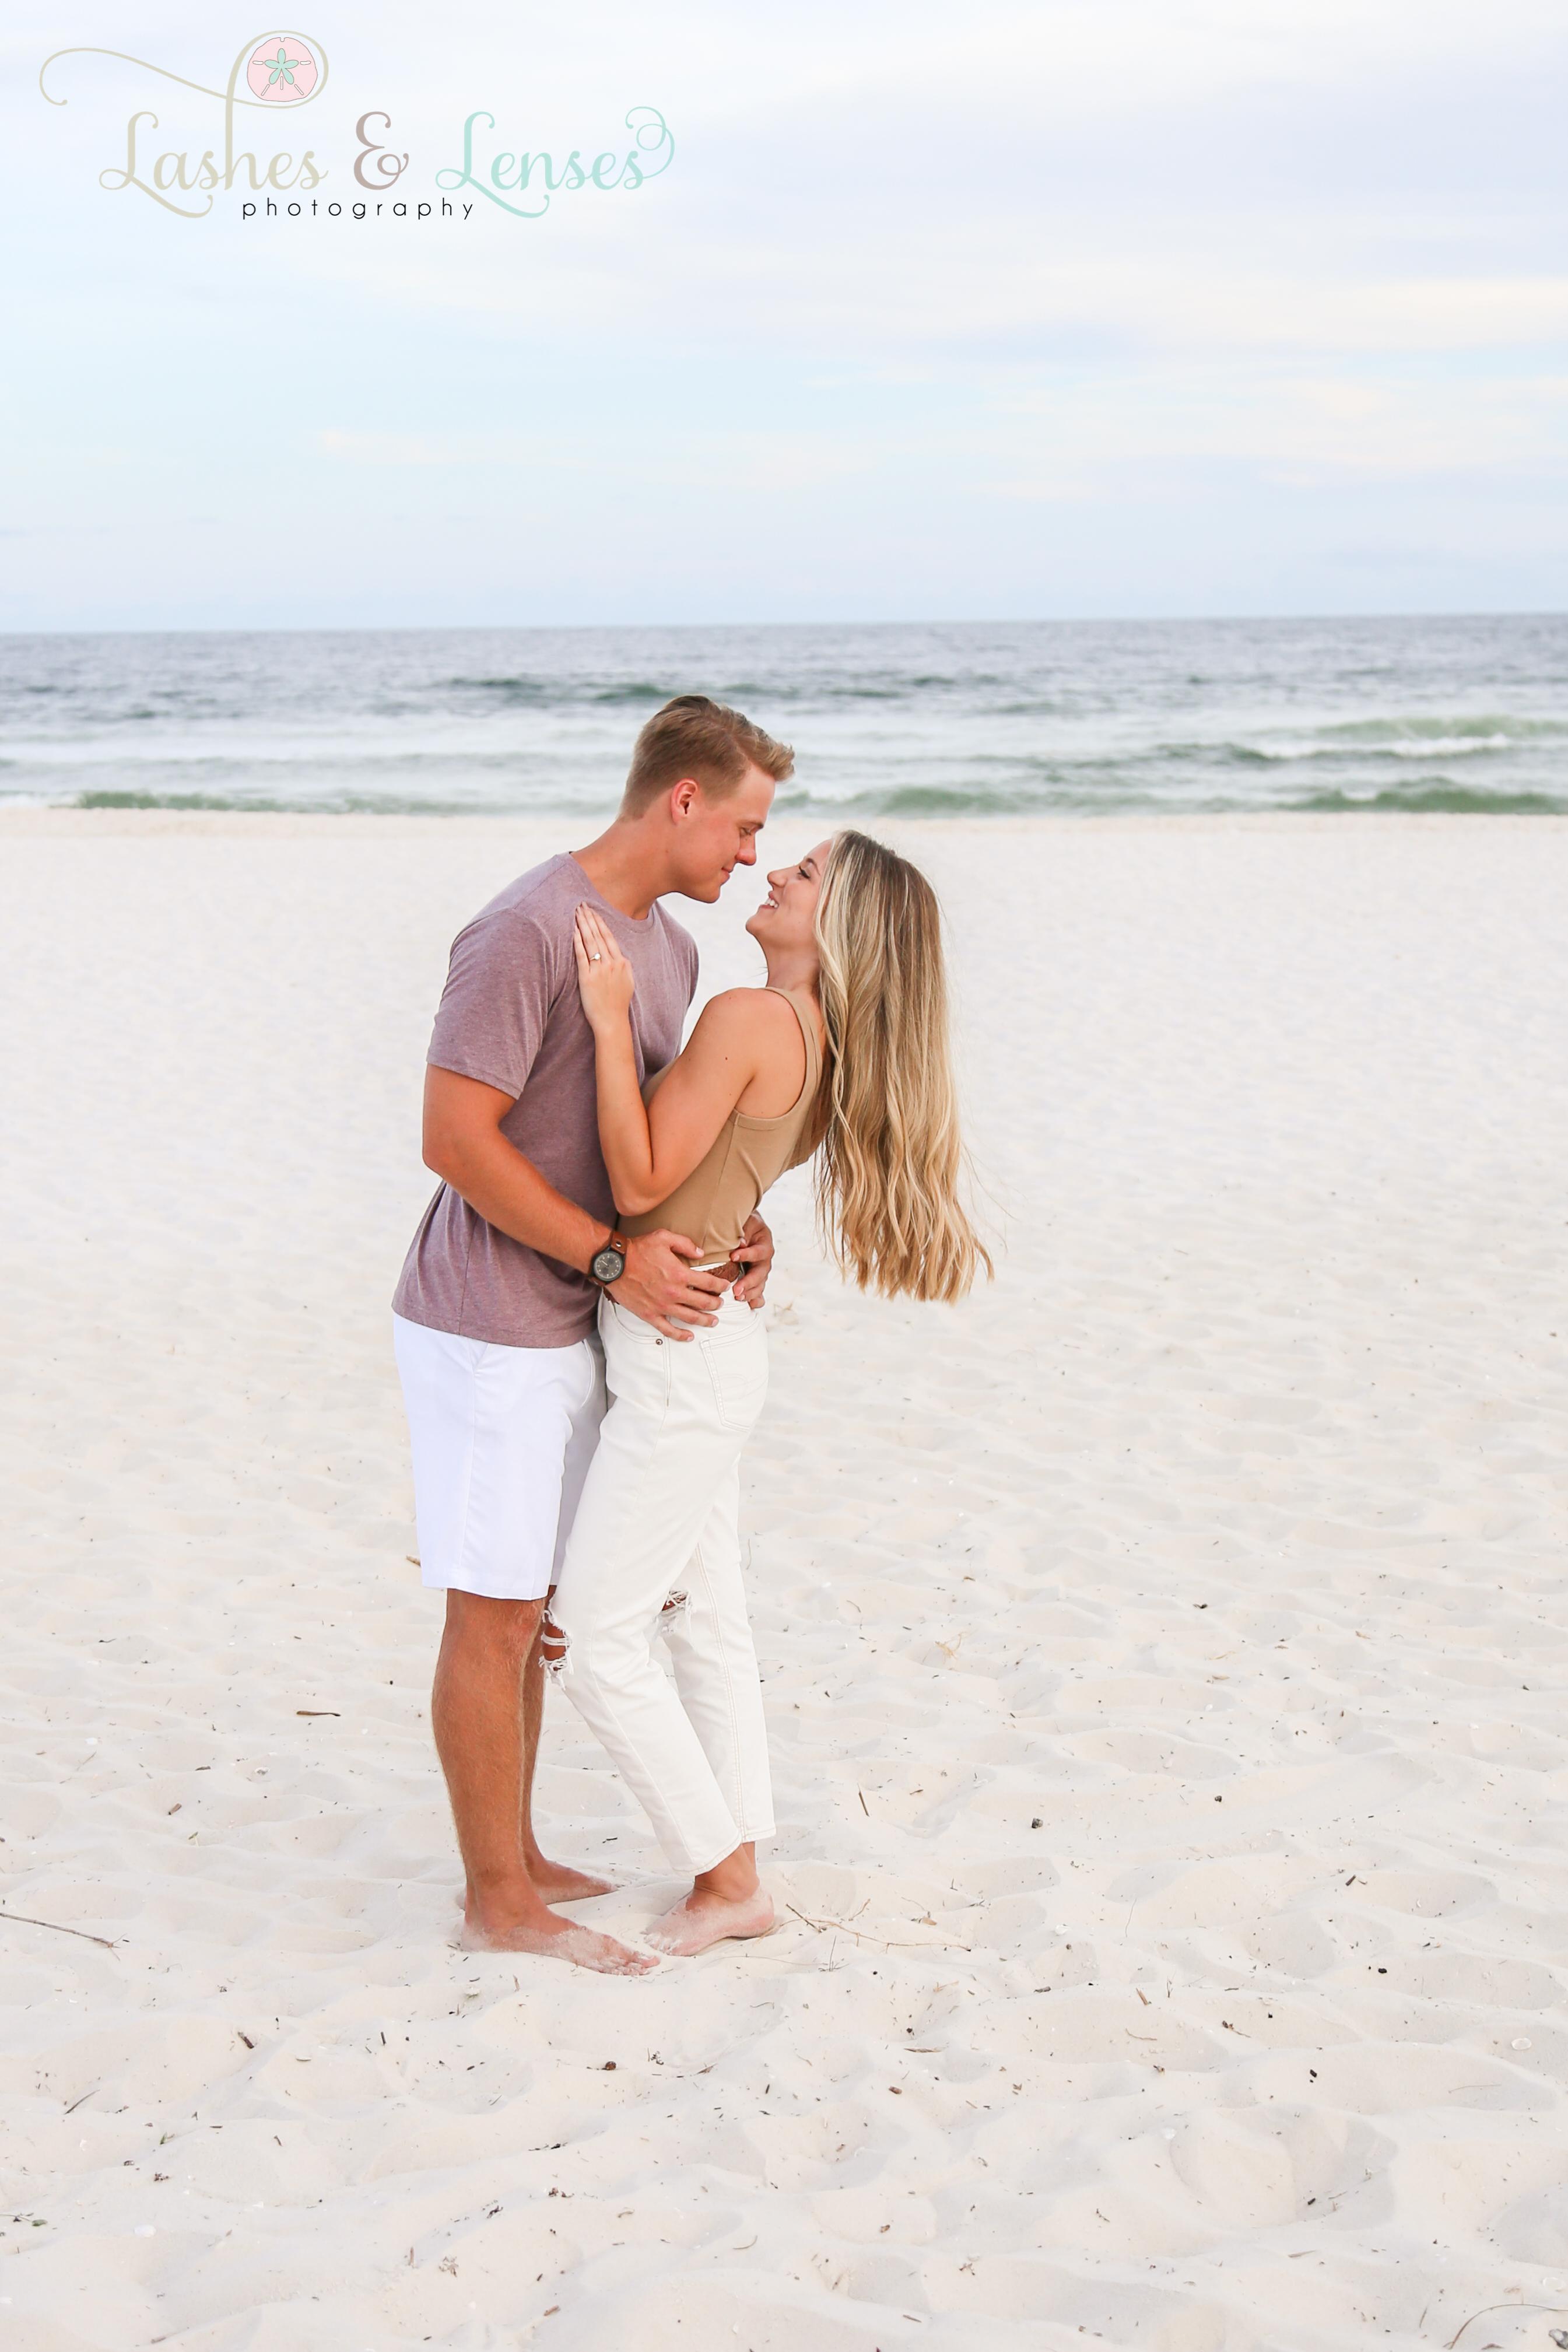 Engagement pose at Johnsons Beach Perdido Key